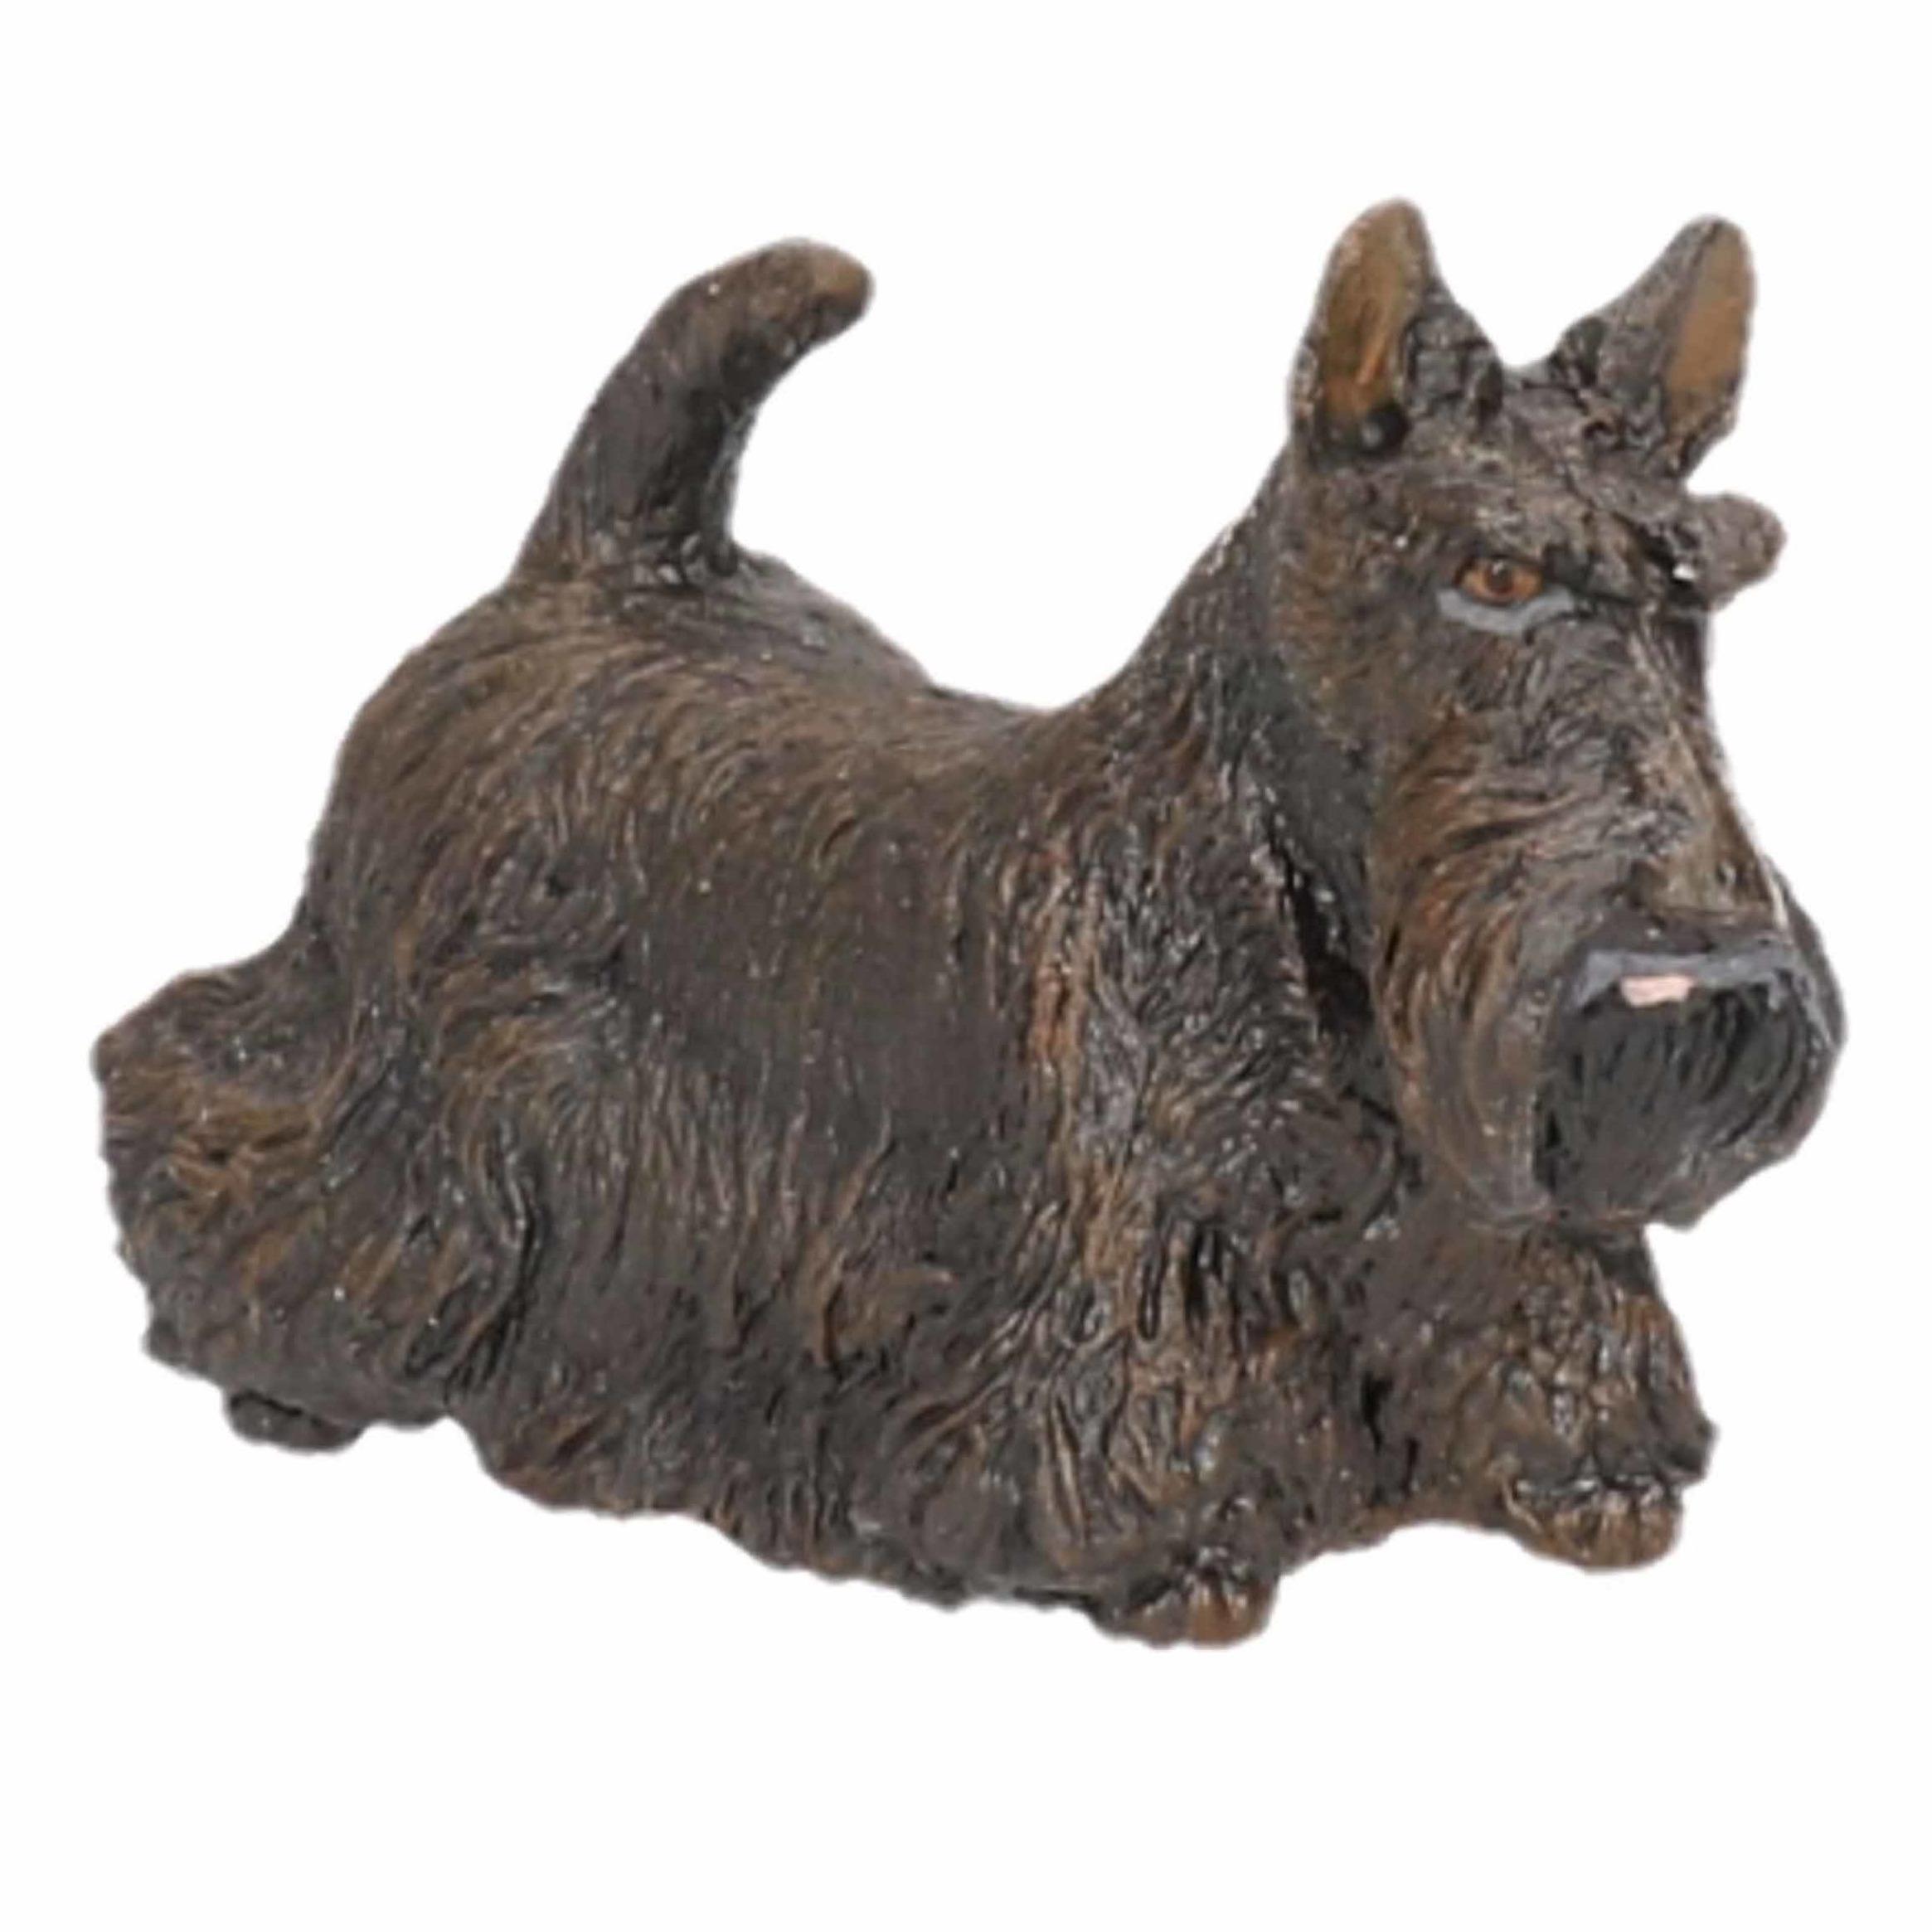 Zwarte Schotse terrier speeldiertje 6 cm